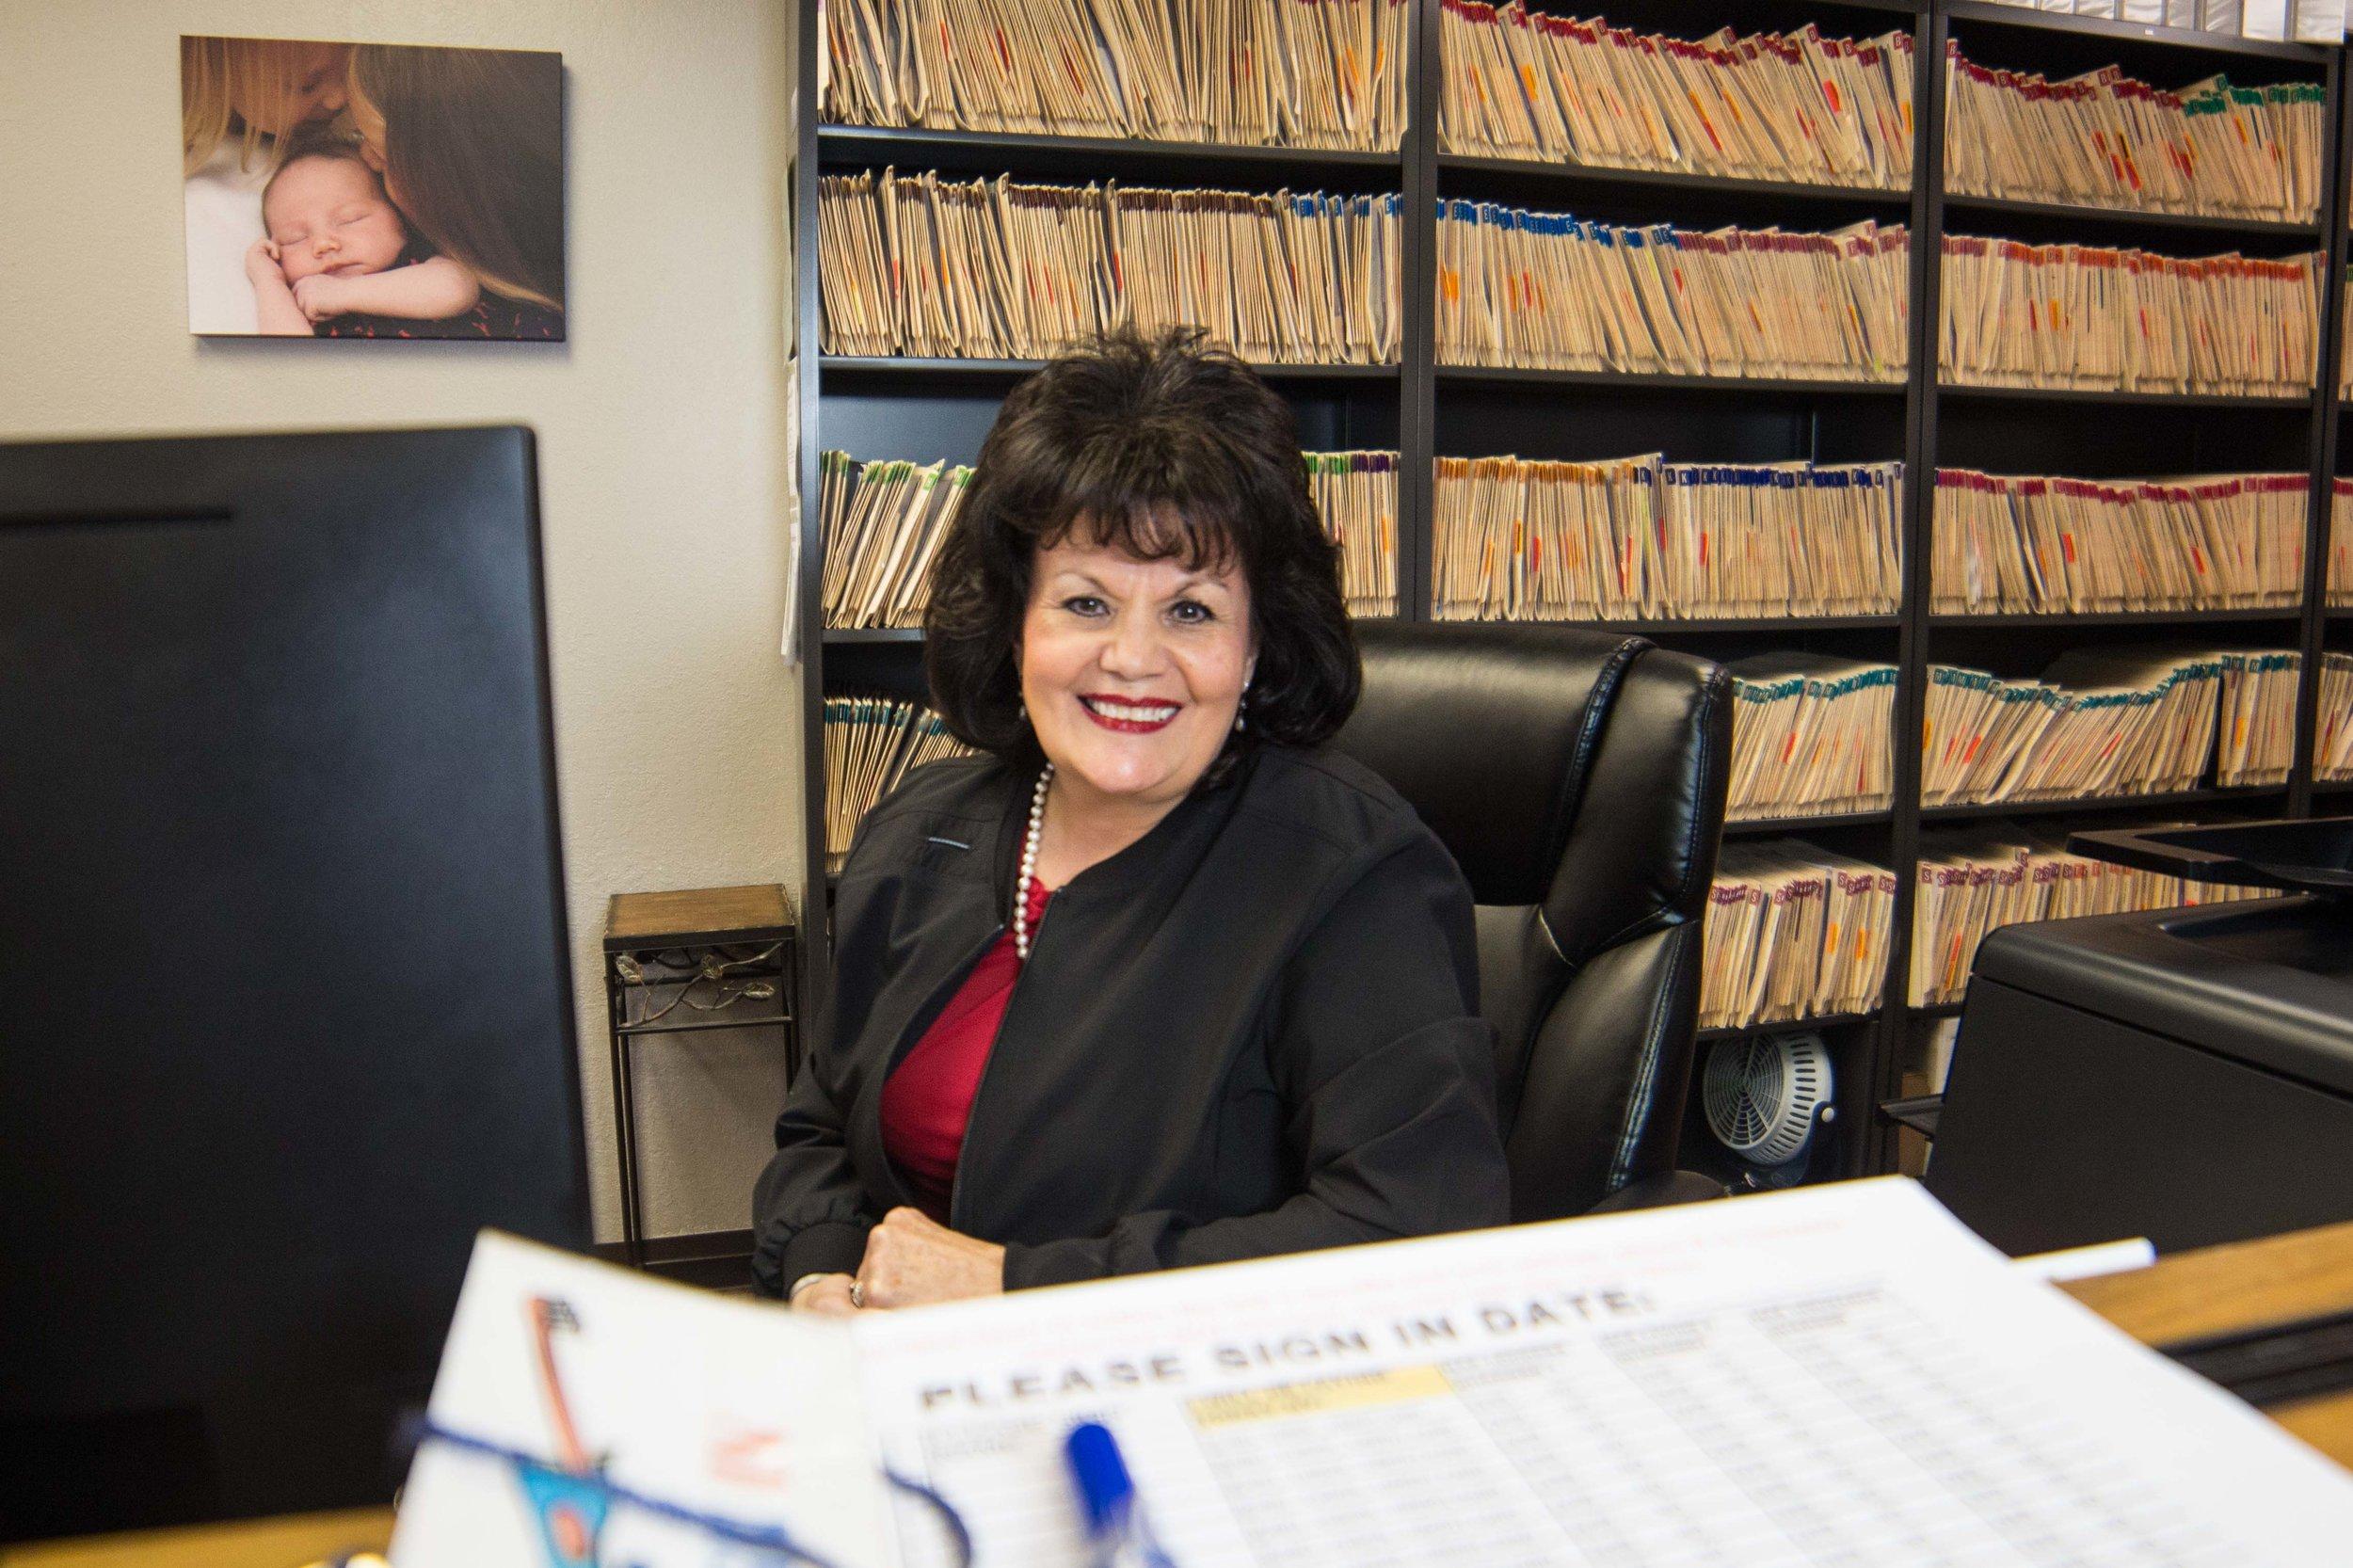 Debi Airington, Check-In Desk